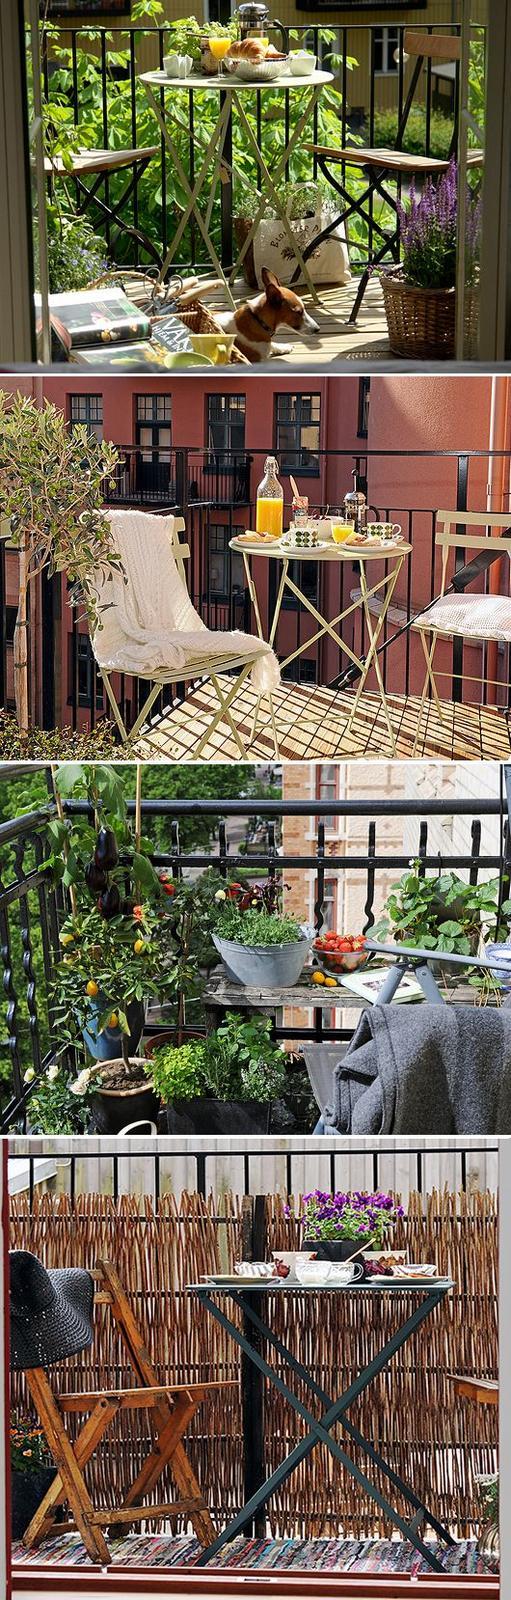 Balkony a malé terasy - Obrázek č. 62